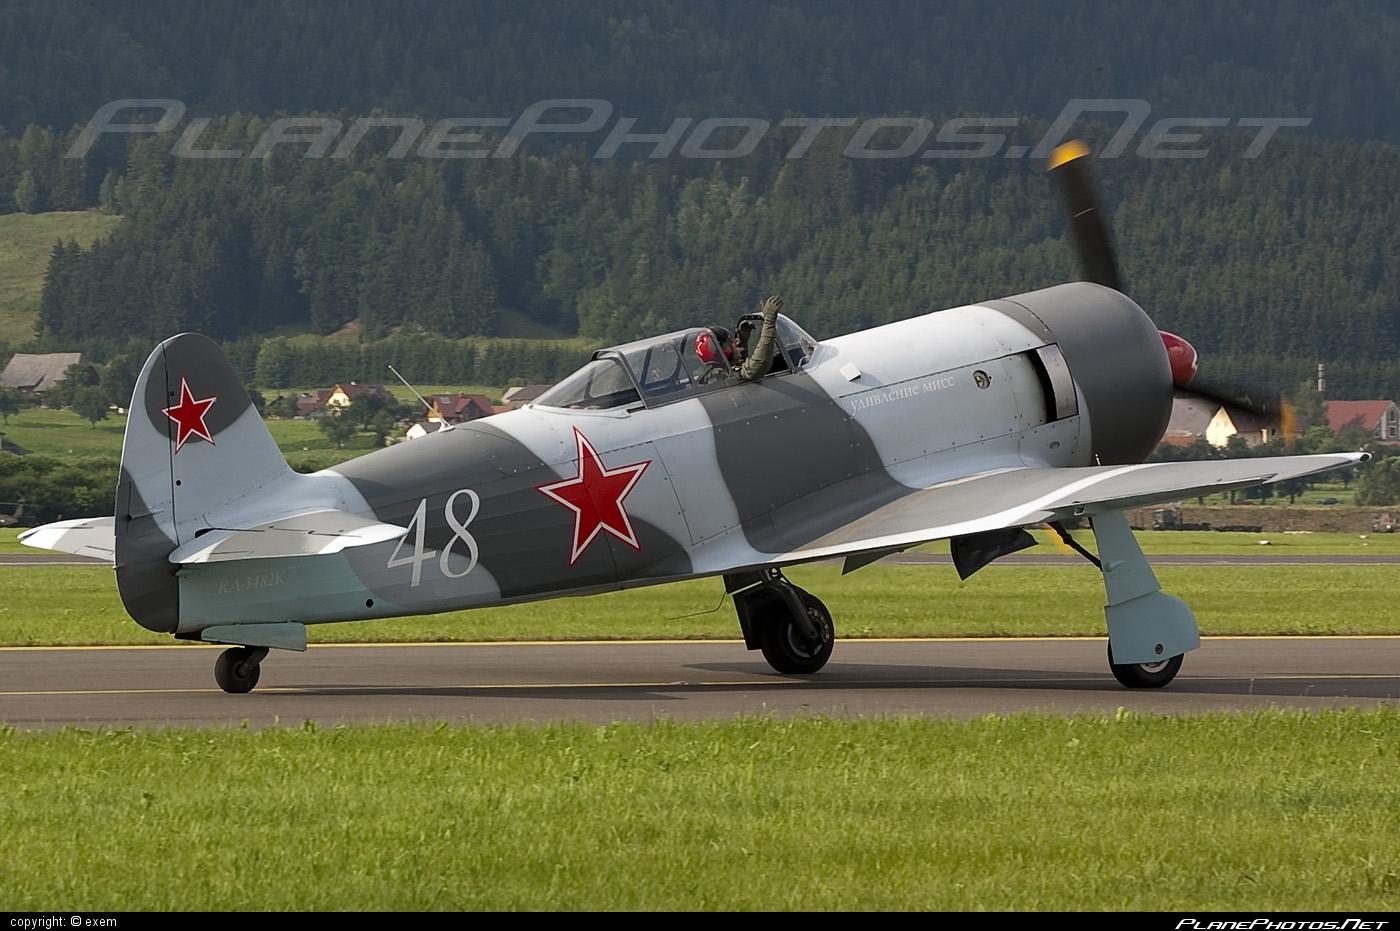 Yakovlev Yak-3U - RA-3482K operated by Private operator #airpower #airpower2009 #yak #yak3 #yak3u #yakovlev